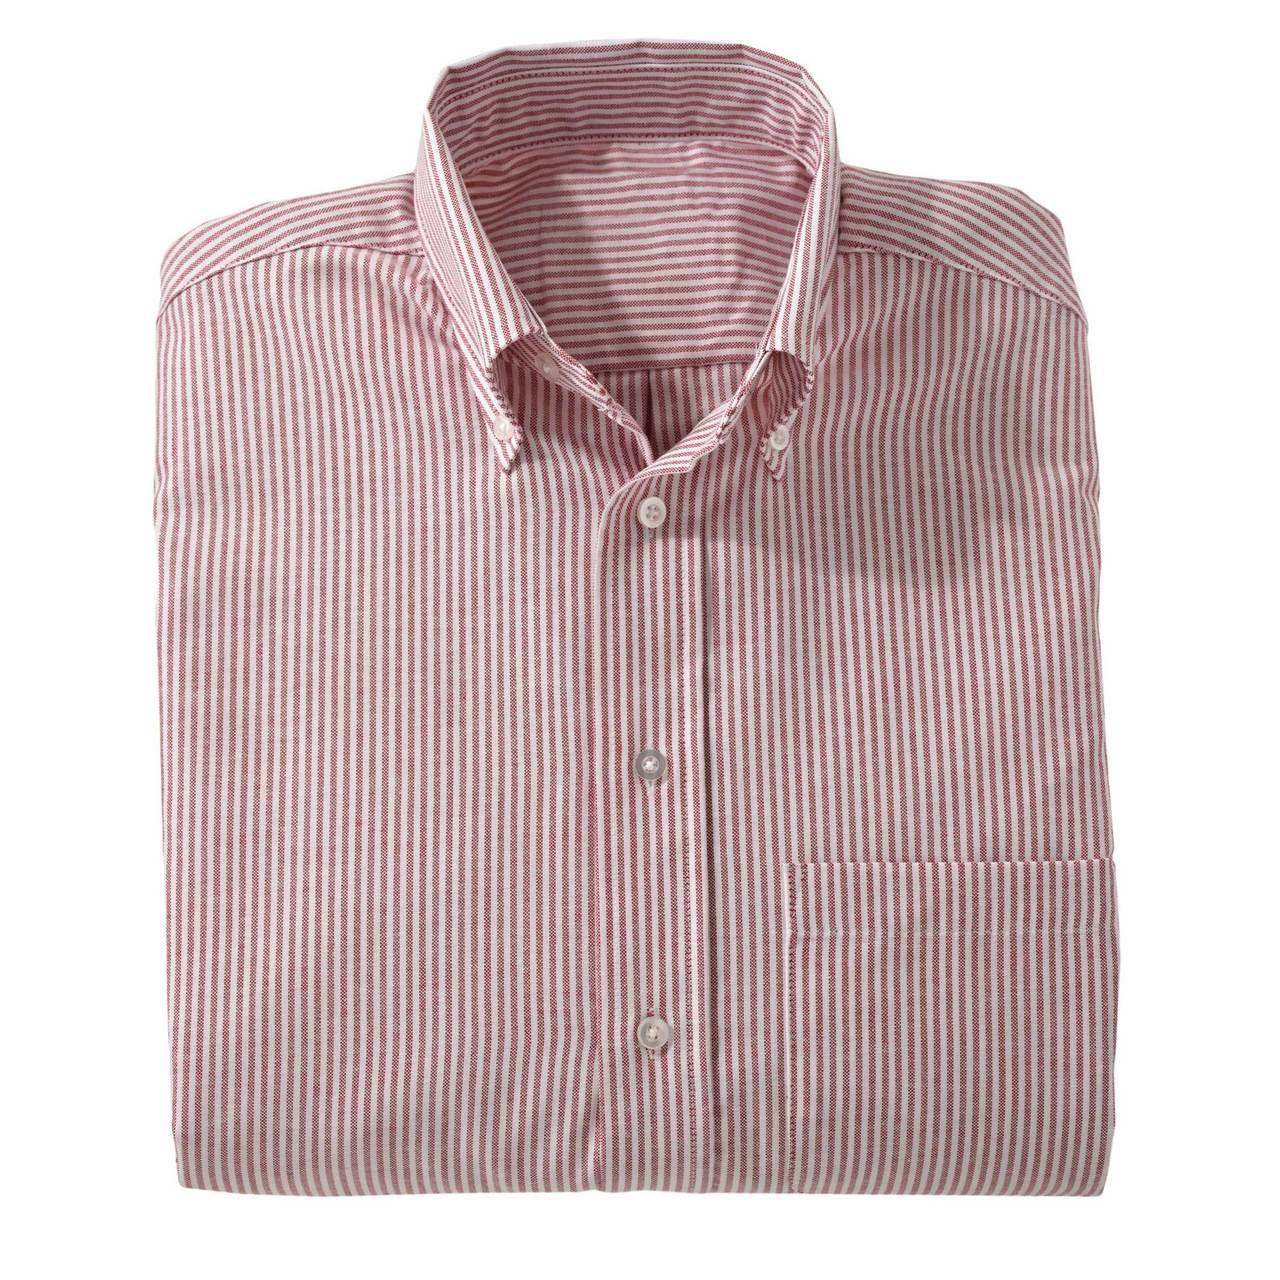 Men's Long Sleeve Easy Care Oxford Shirt